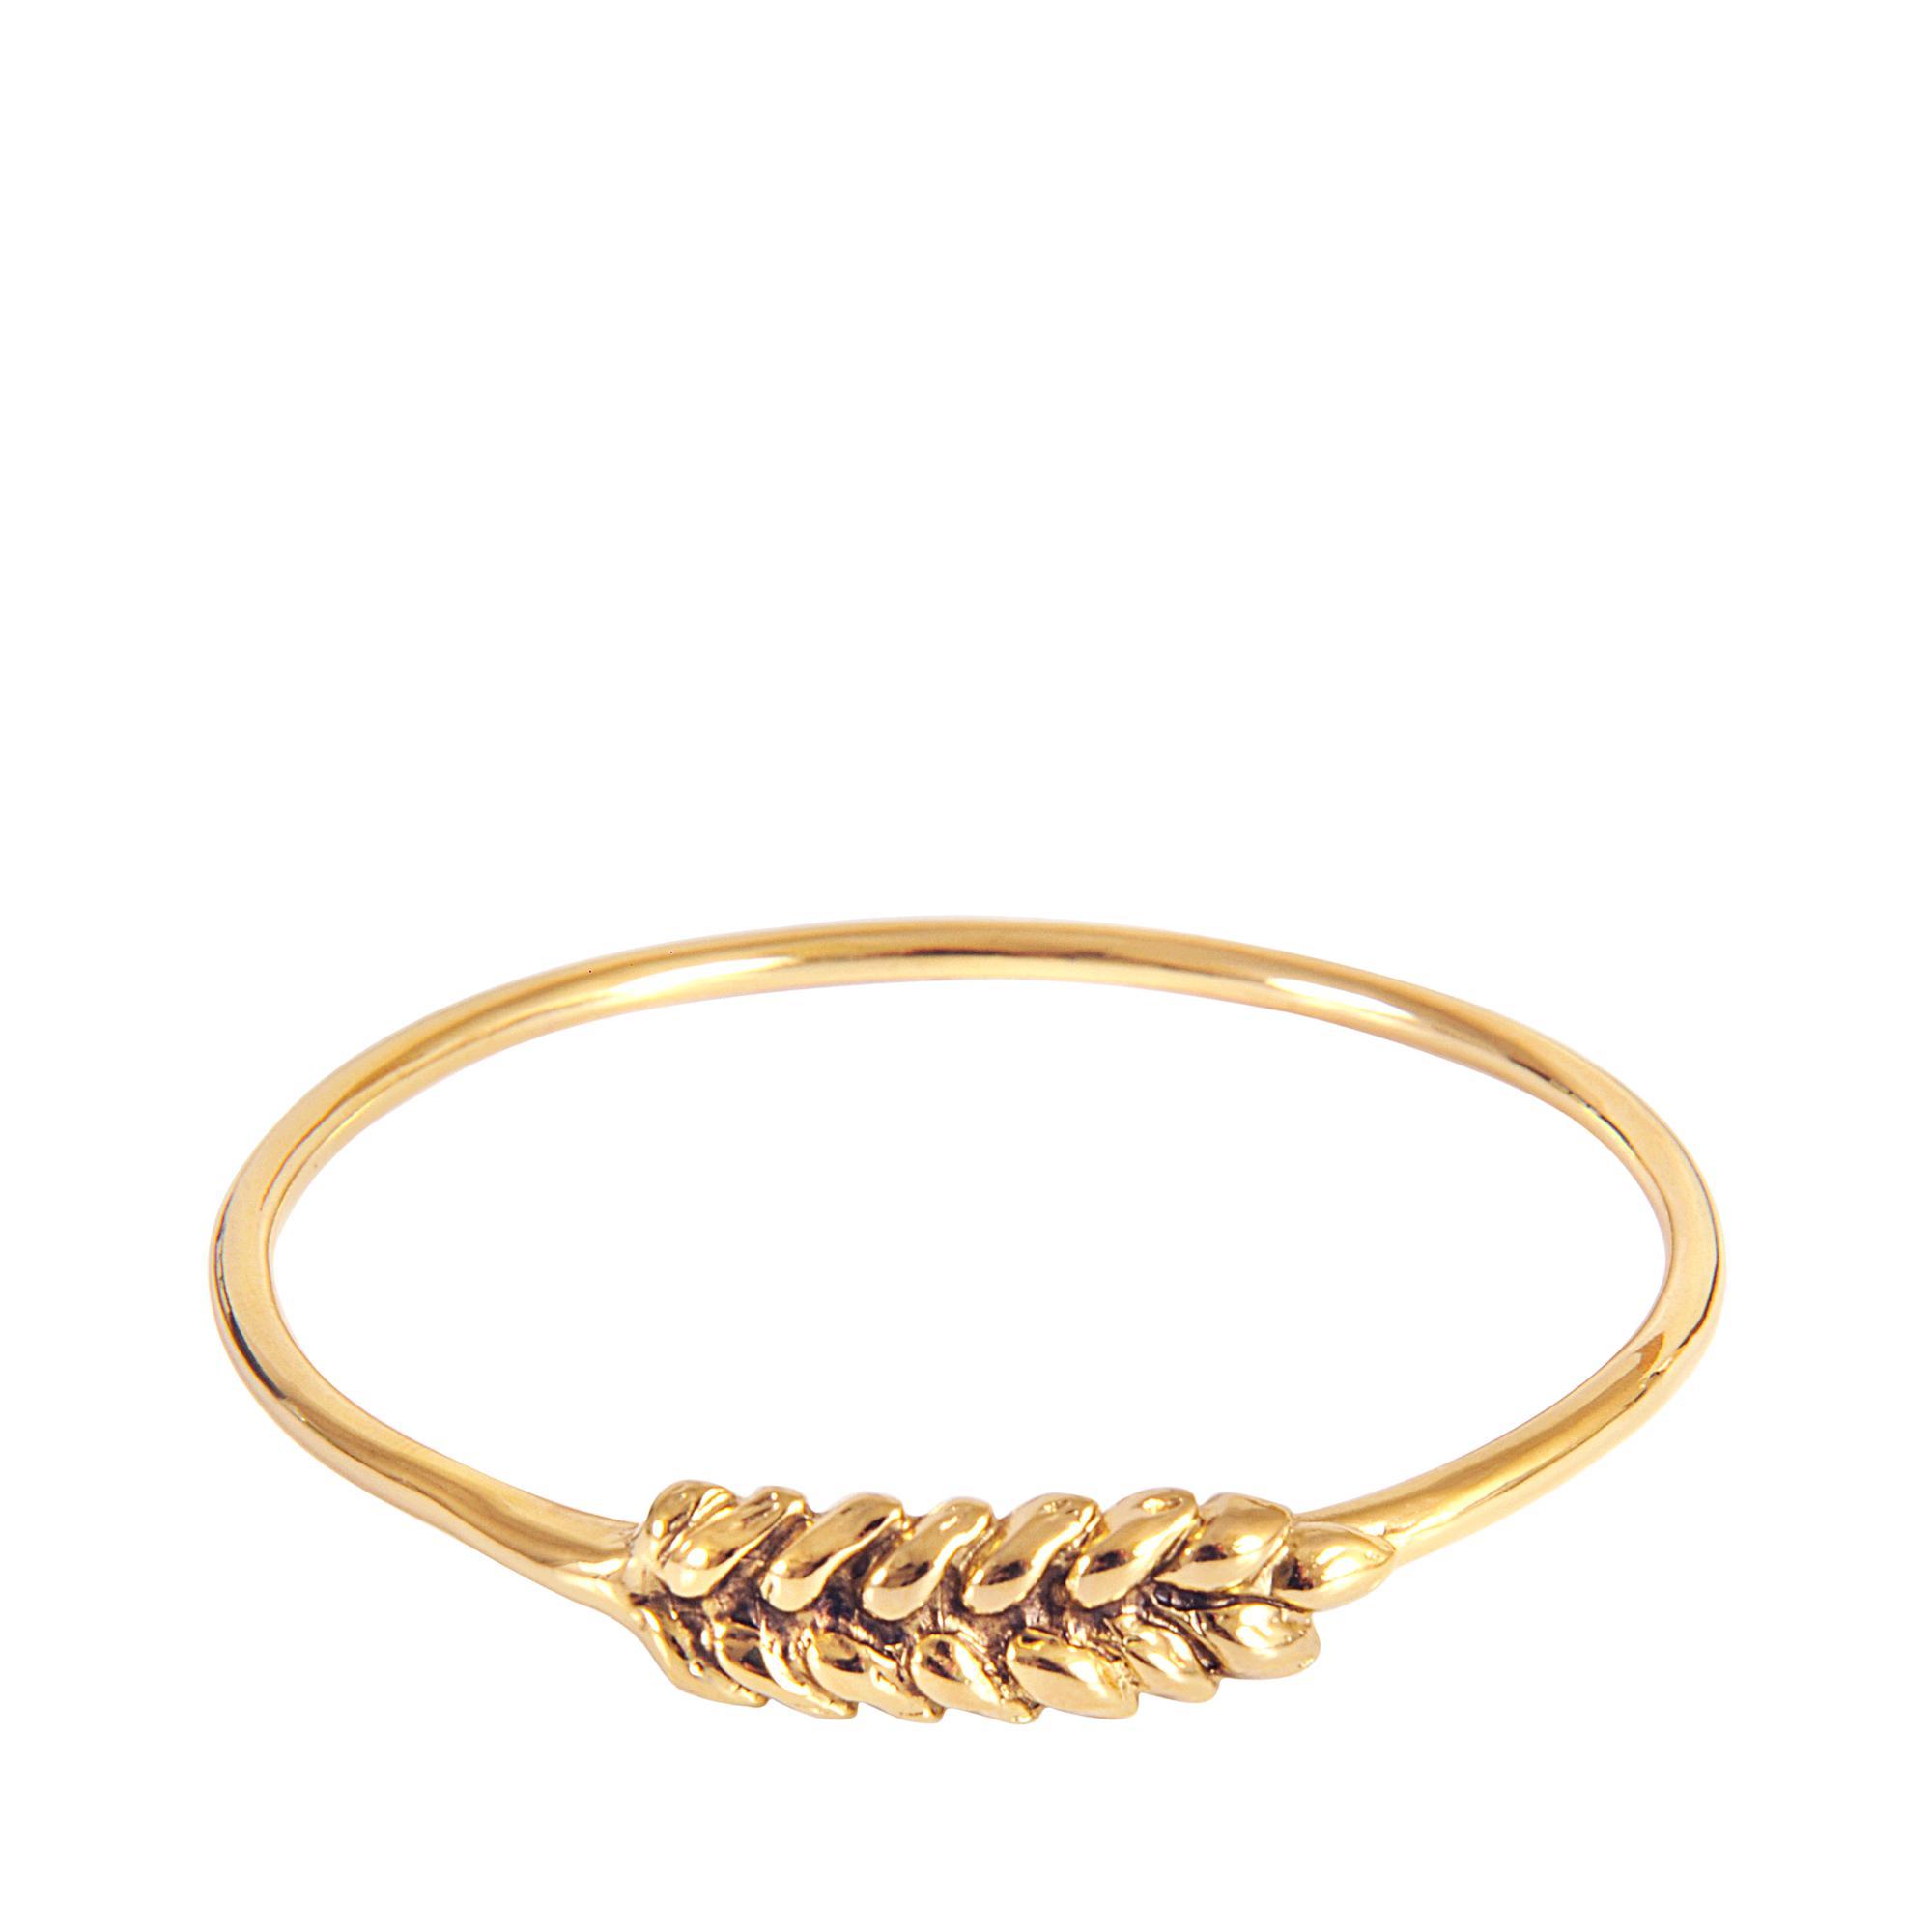 Wheat Toi et Moi Bracelet in 18K Gold-Plated Brass Aurélie Bidermann 5BbnBEnXcQ